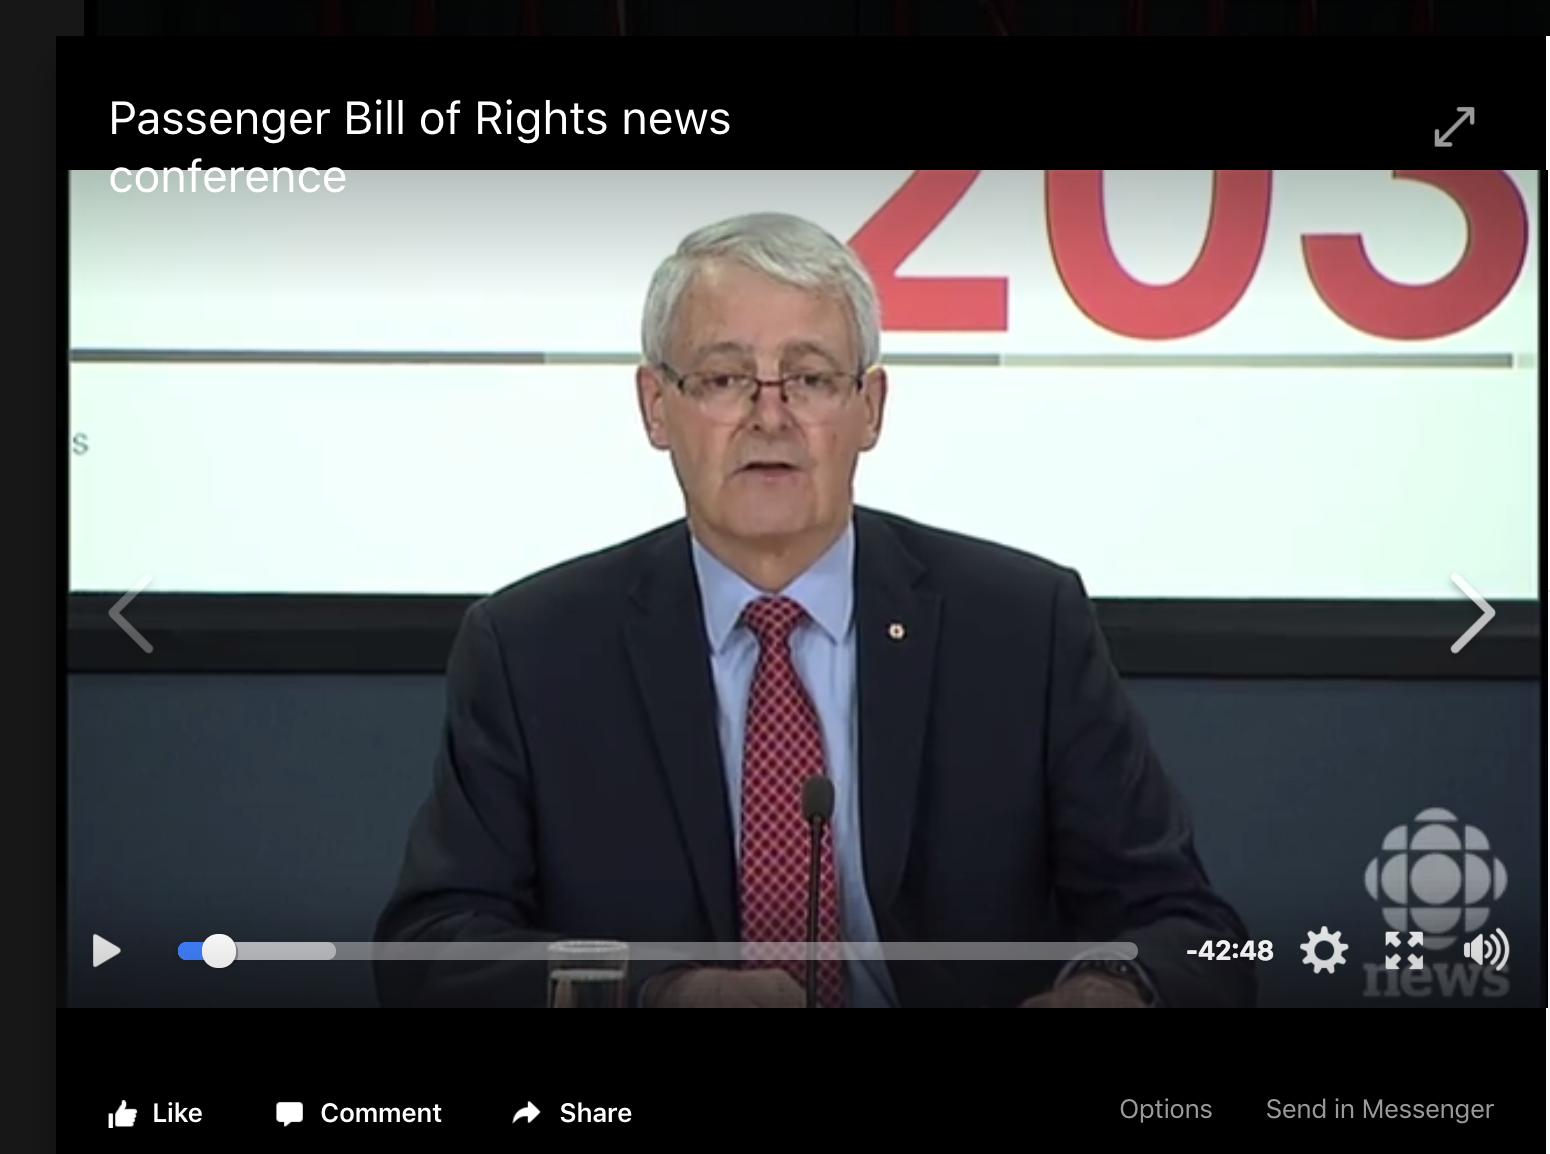 Transport Minister Marc Garneau - Passenger Bill of Rights news conference